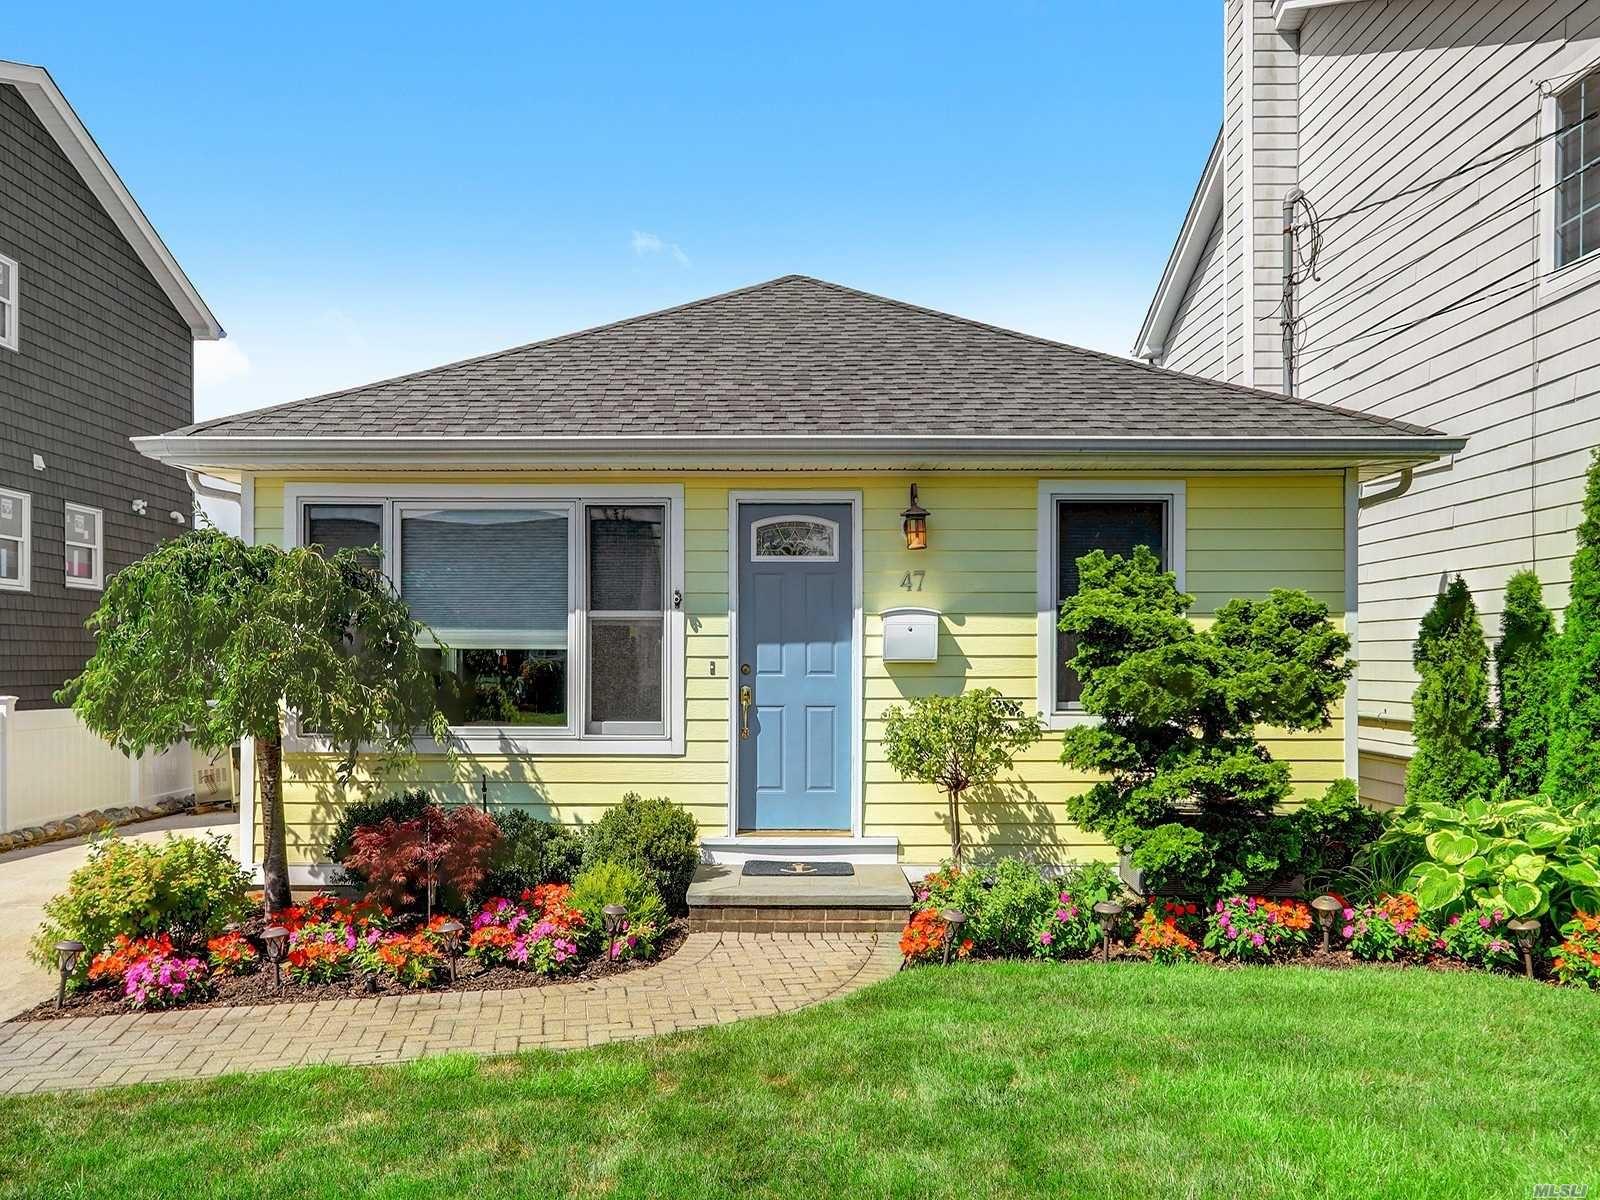 47 Jetmore Place, Massapequa, NY 11758 - MLS#: 3237740